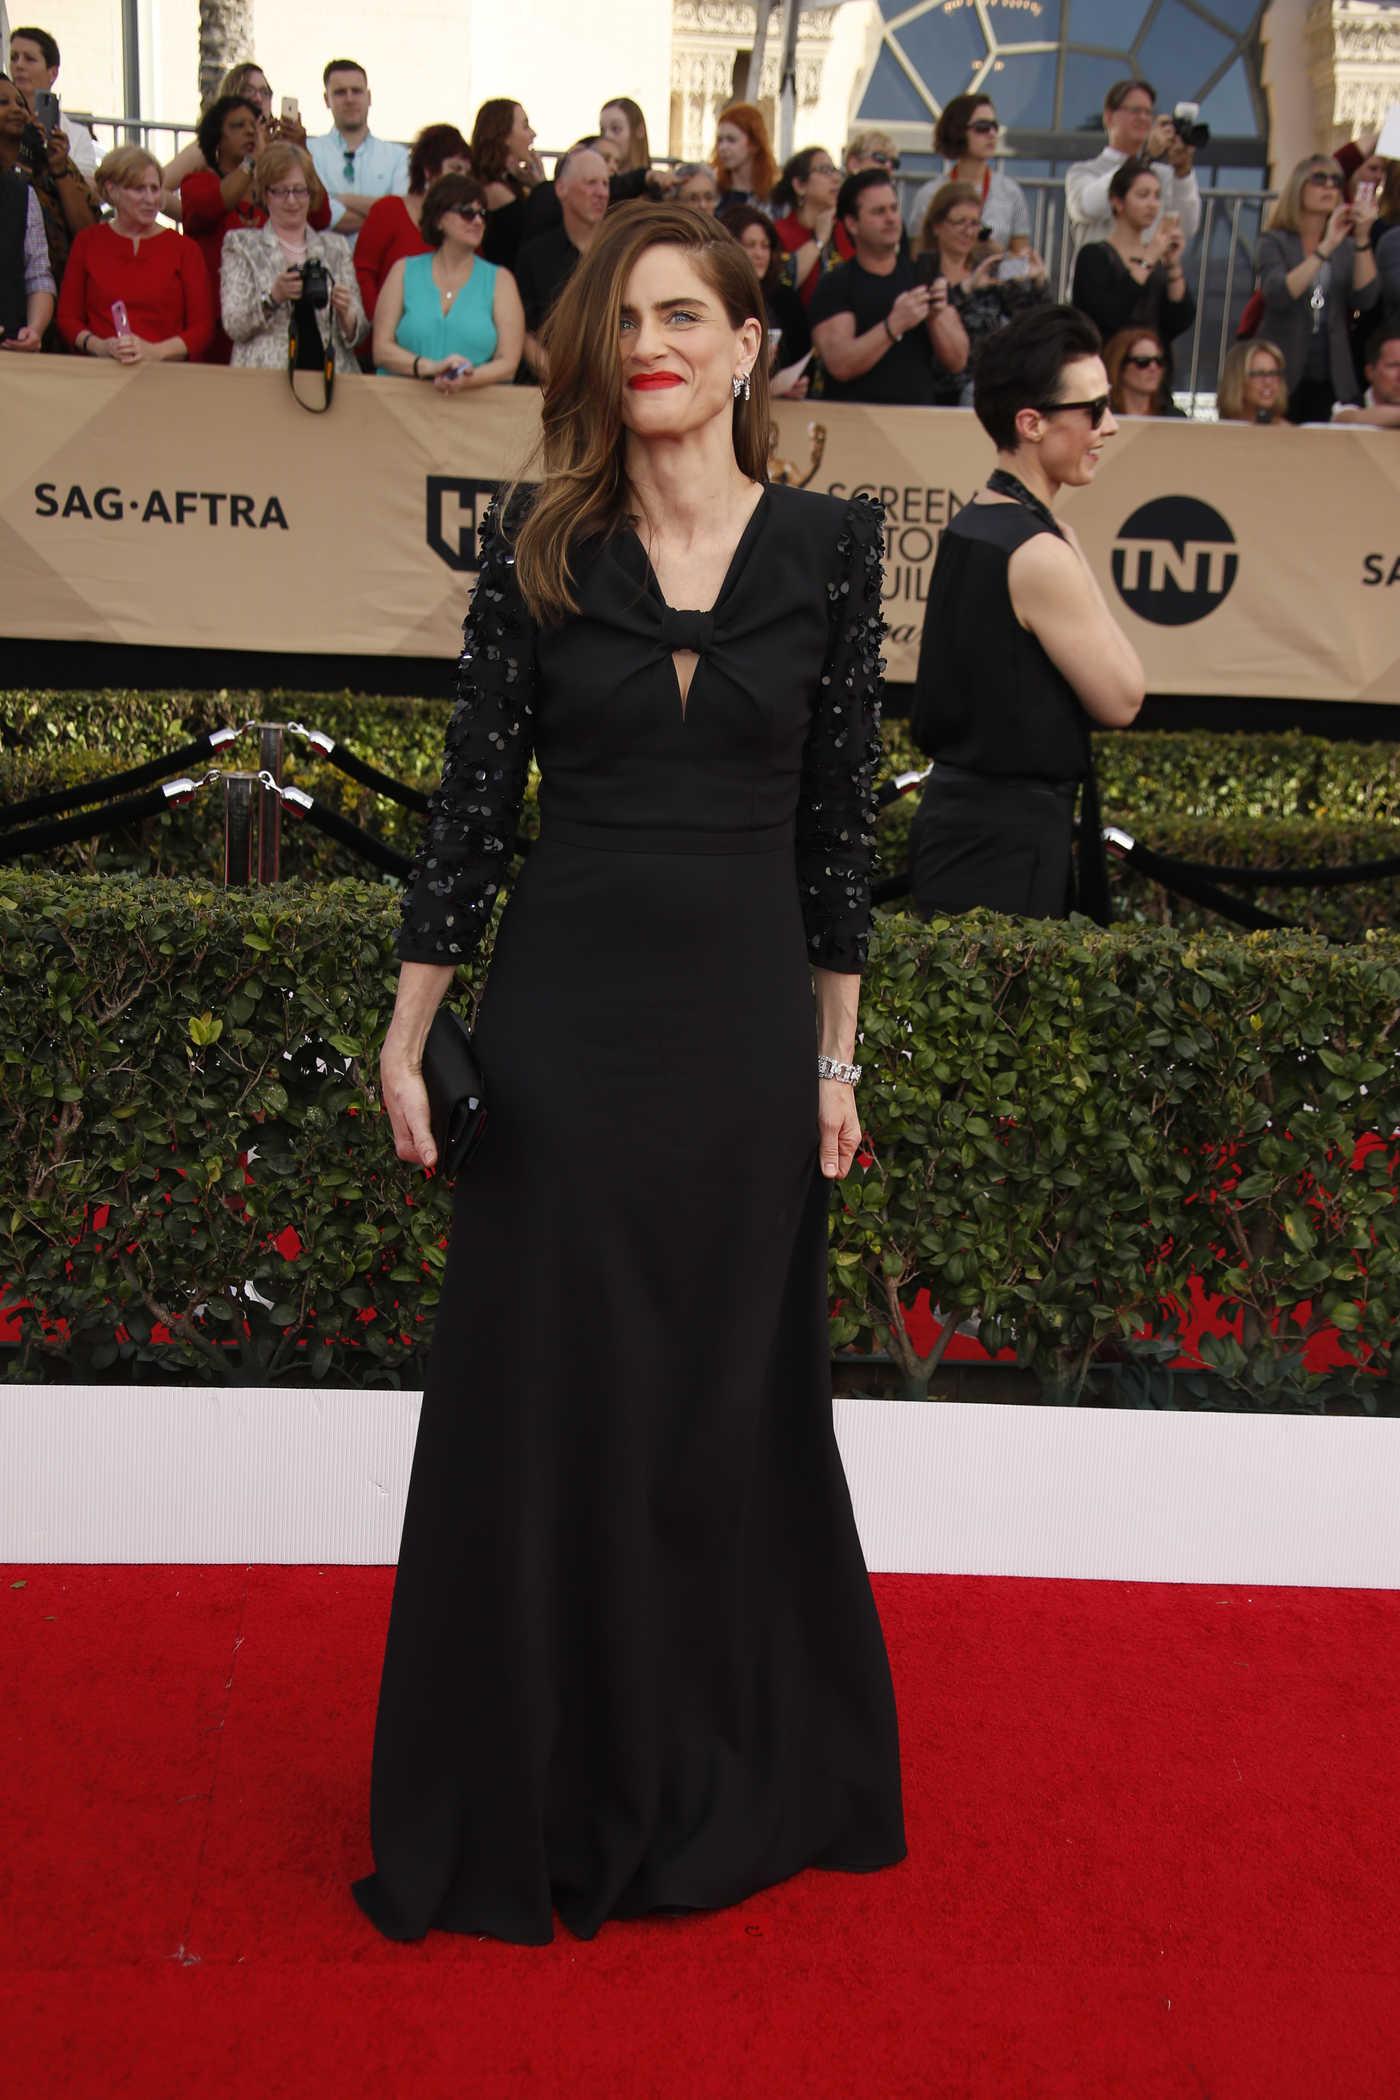 Amanda Peet at the 23rd Annual Screen Actors Guild Awards in Los Angeles 01/29/2017